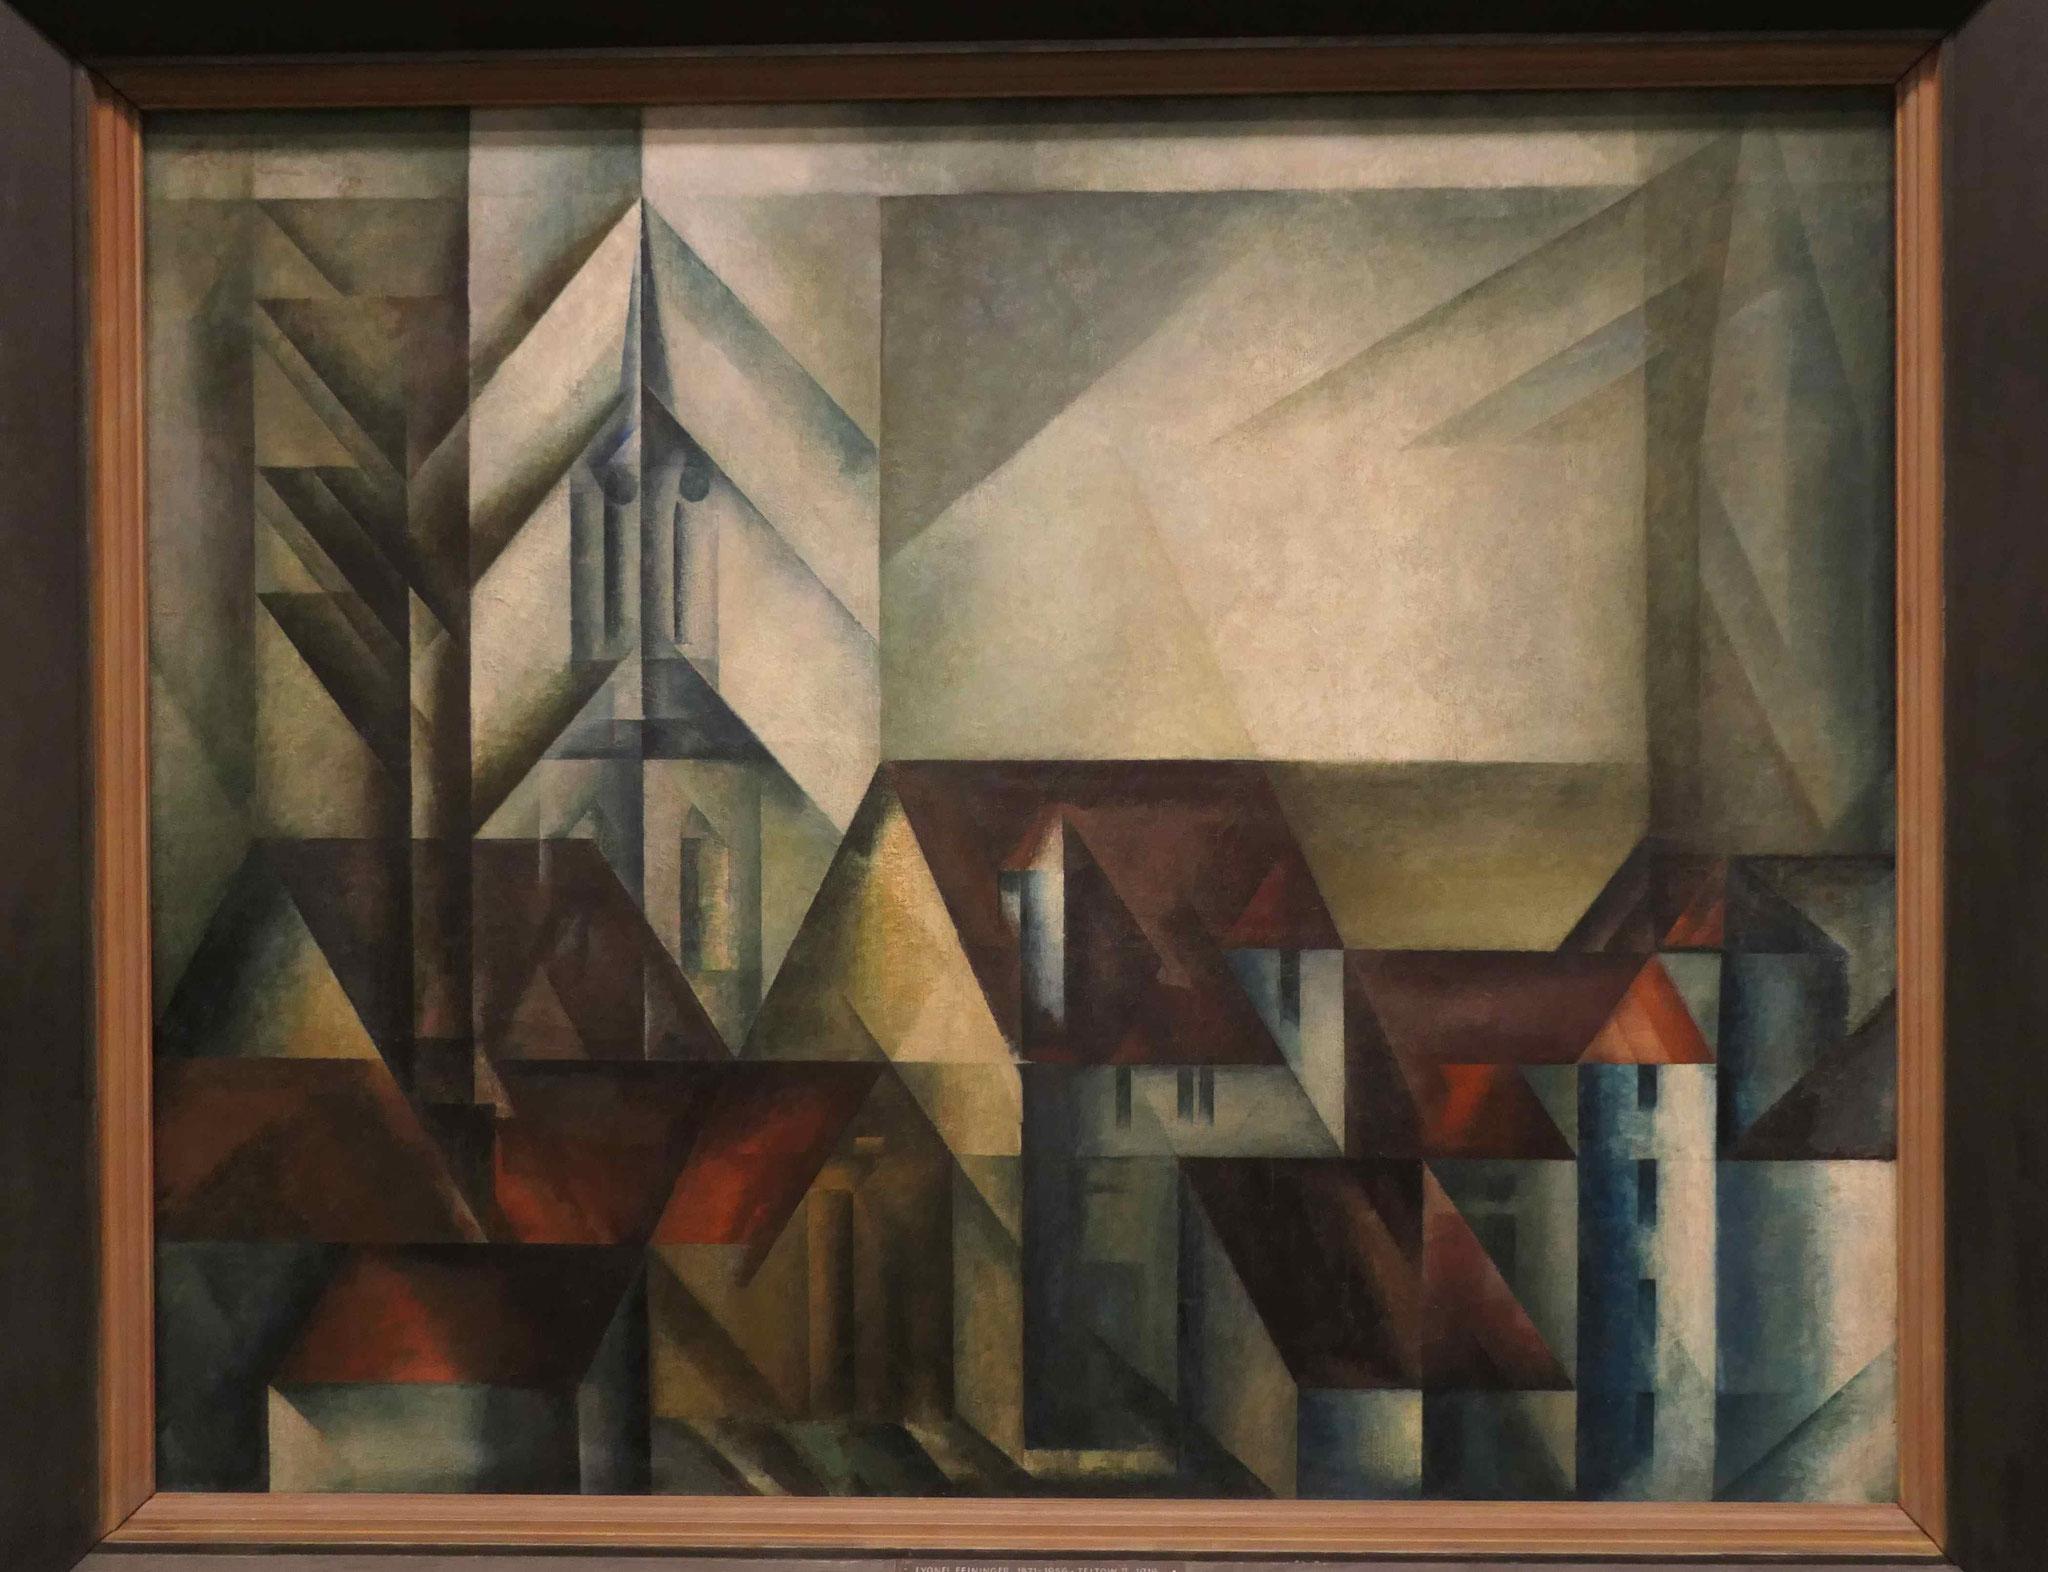 Lyonel Feininger, Teltow II. 1918, Neue Nationalgalerie Berlin